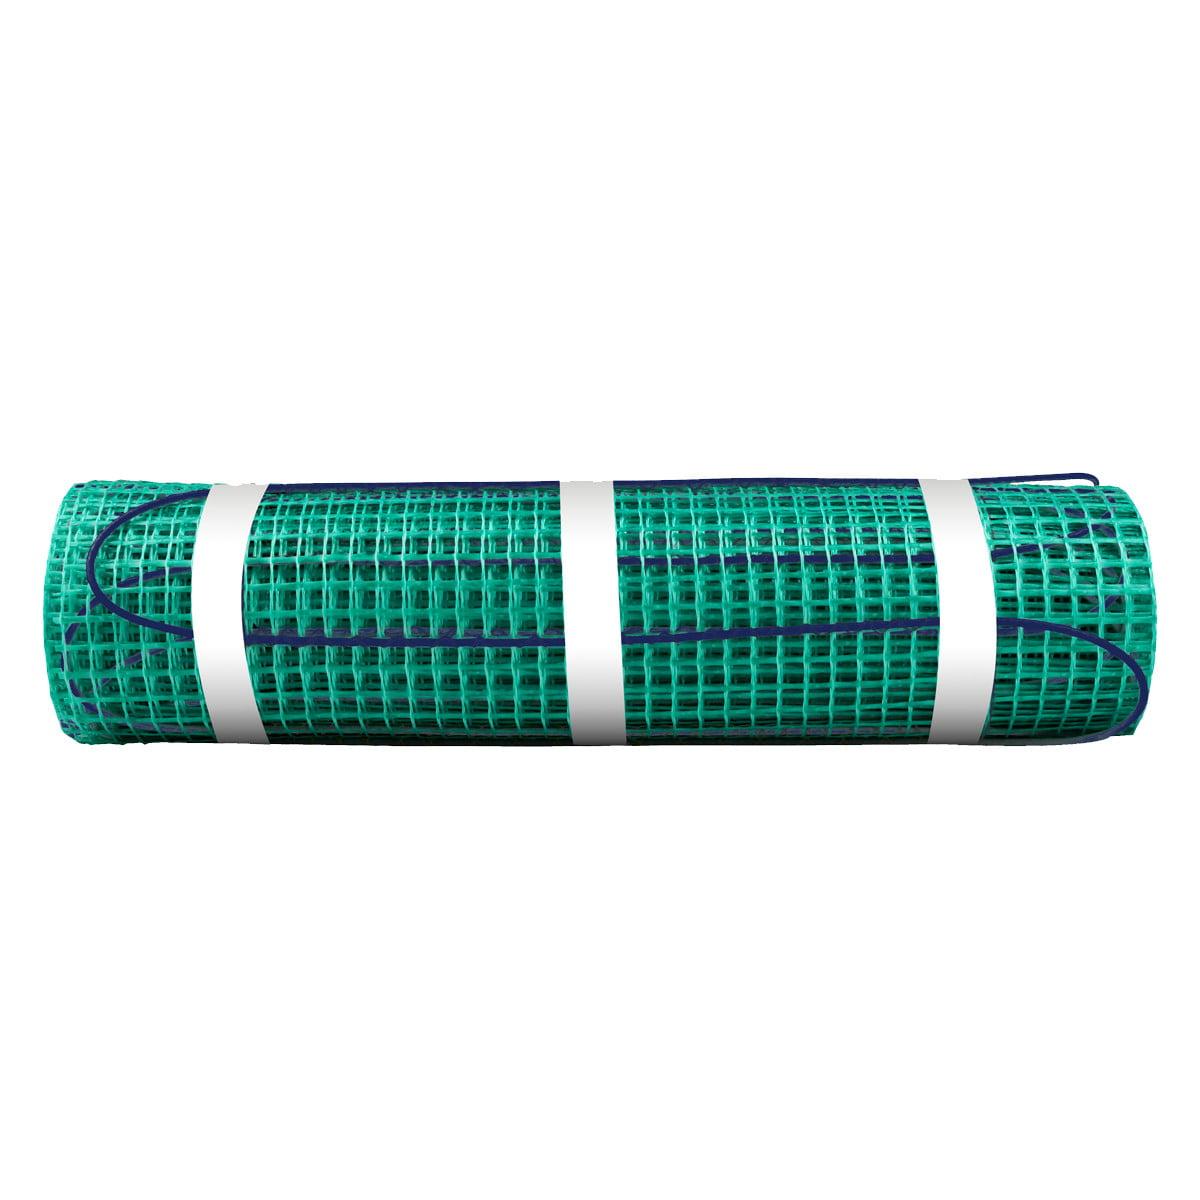 WarmlyYours TRT120-1.5x48 TempZone 120V 9.0A 1.5 Foot x 48 Foot Flex Roll